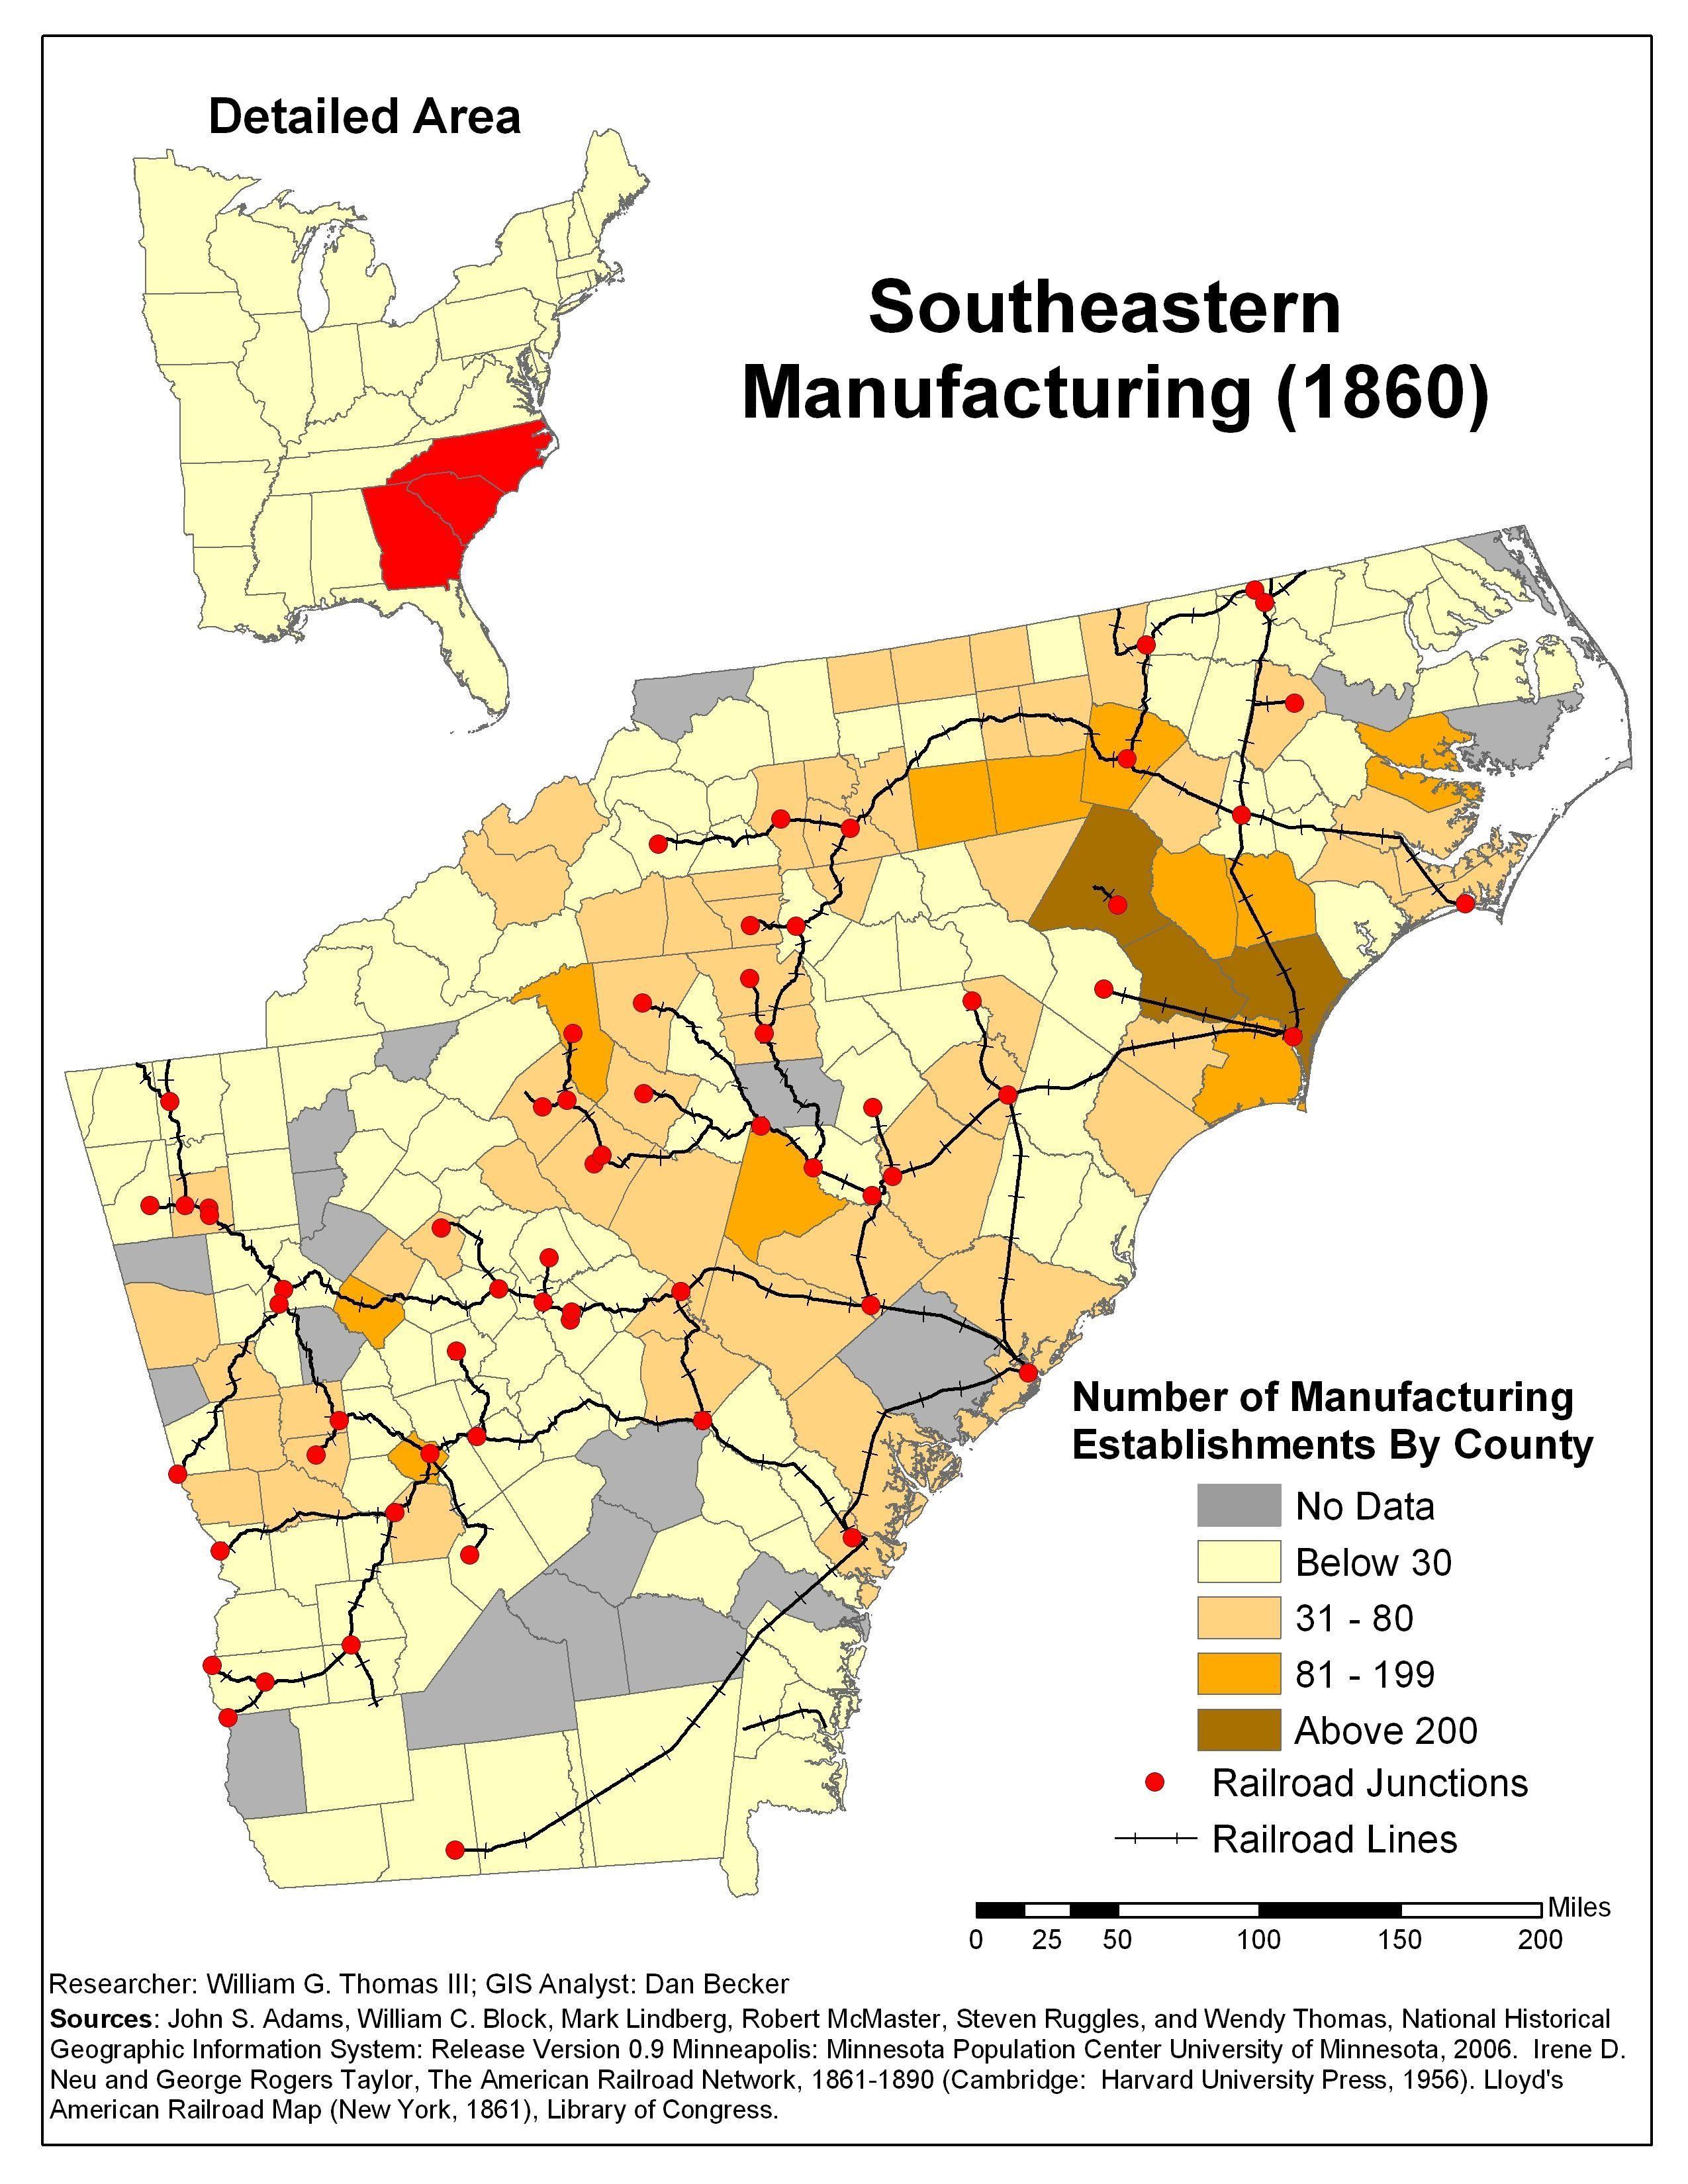 Southeastern Manufacturing